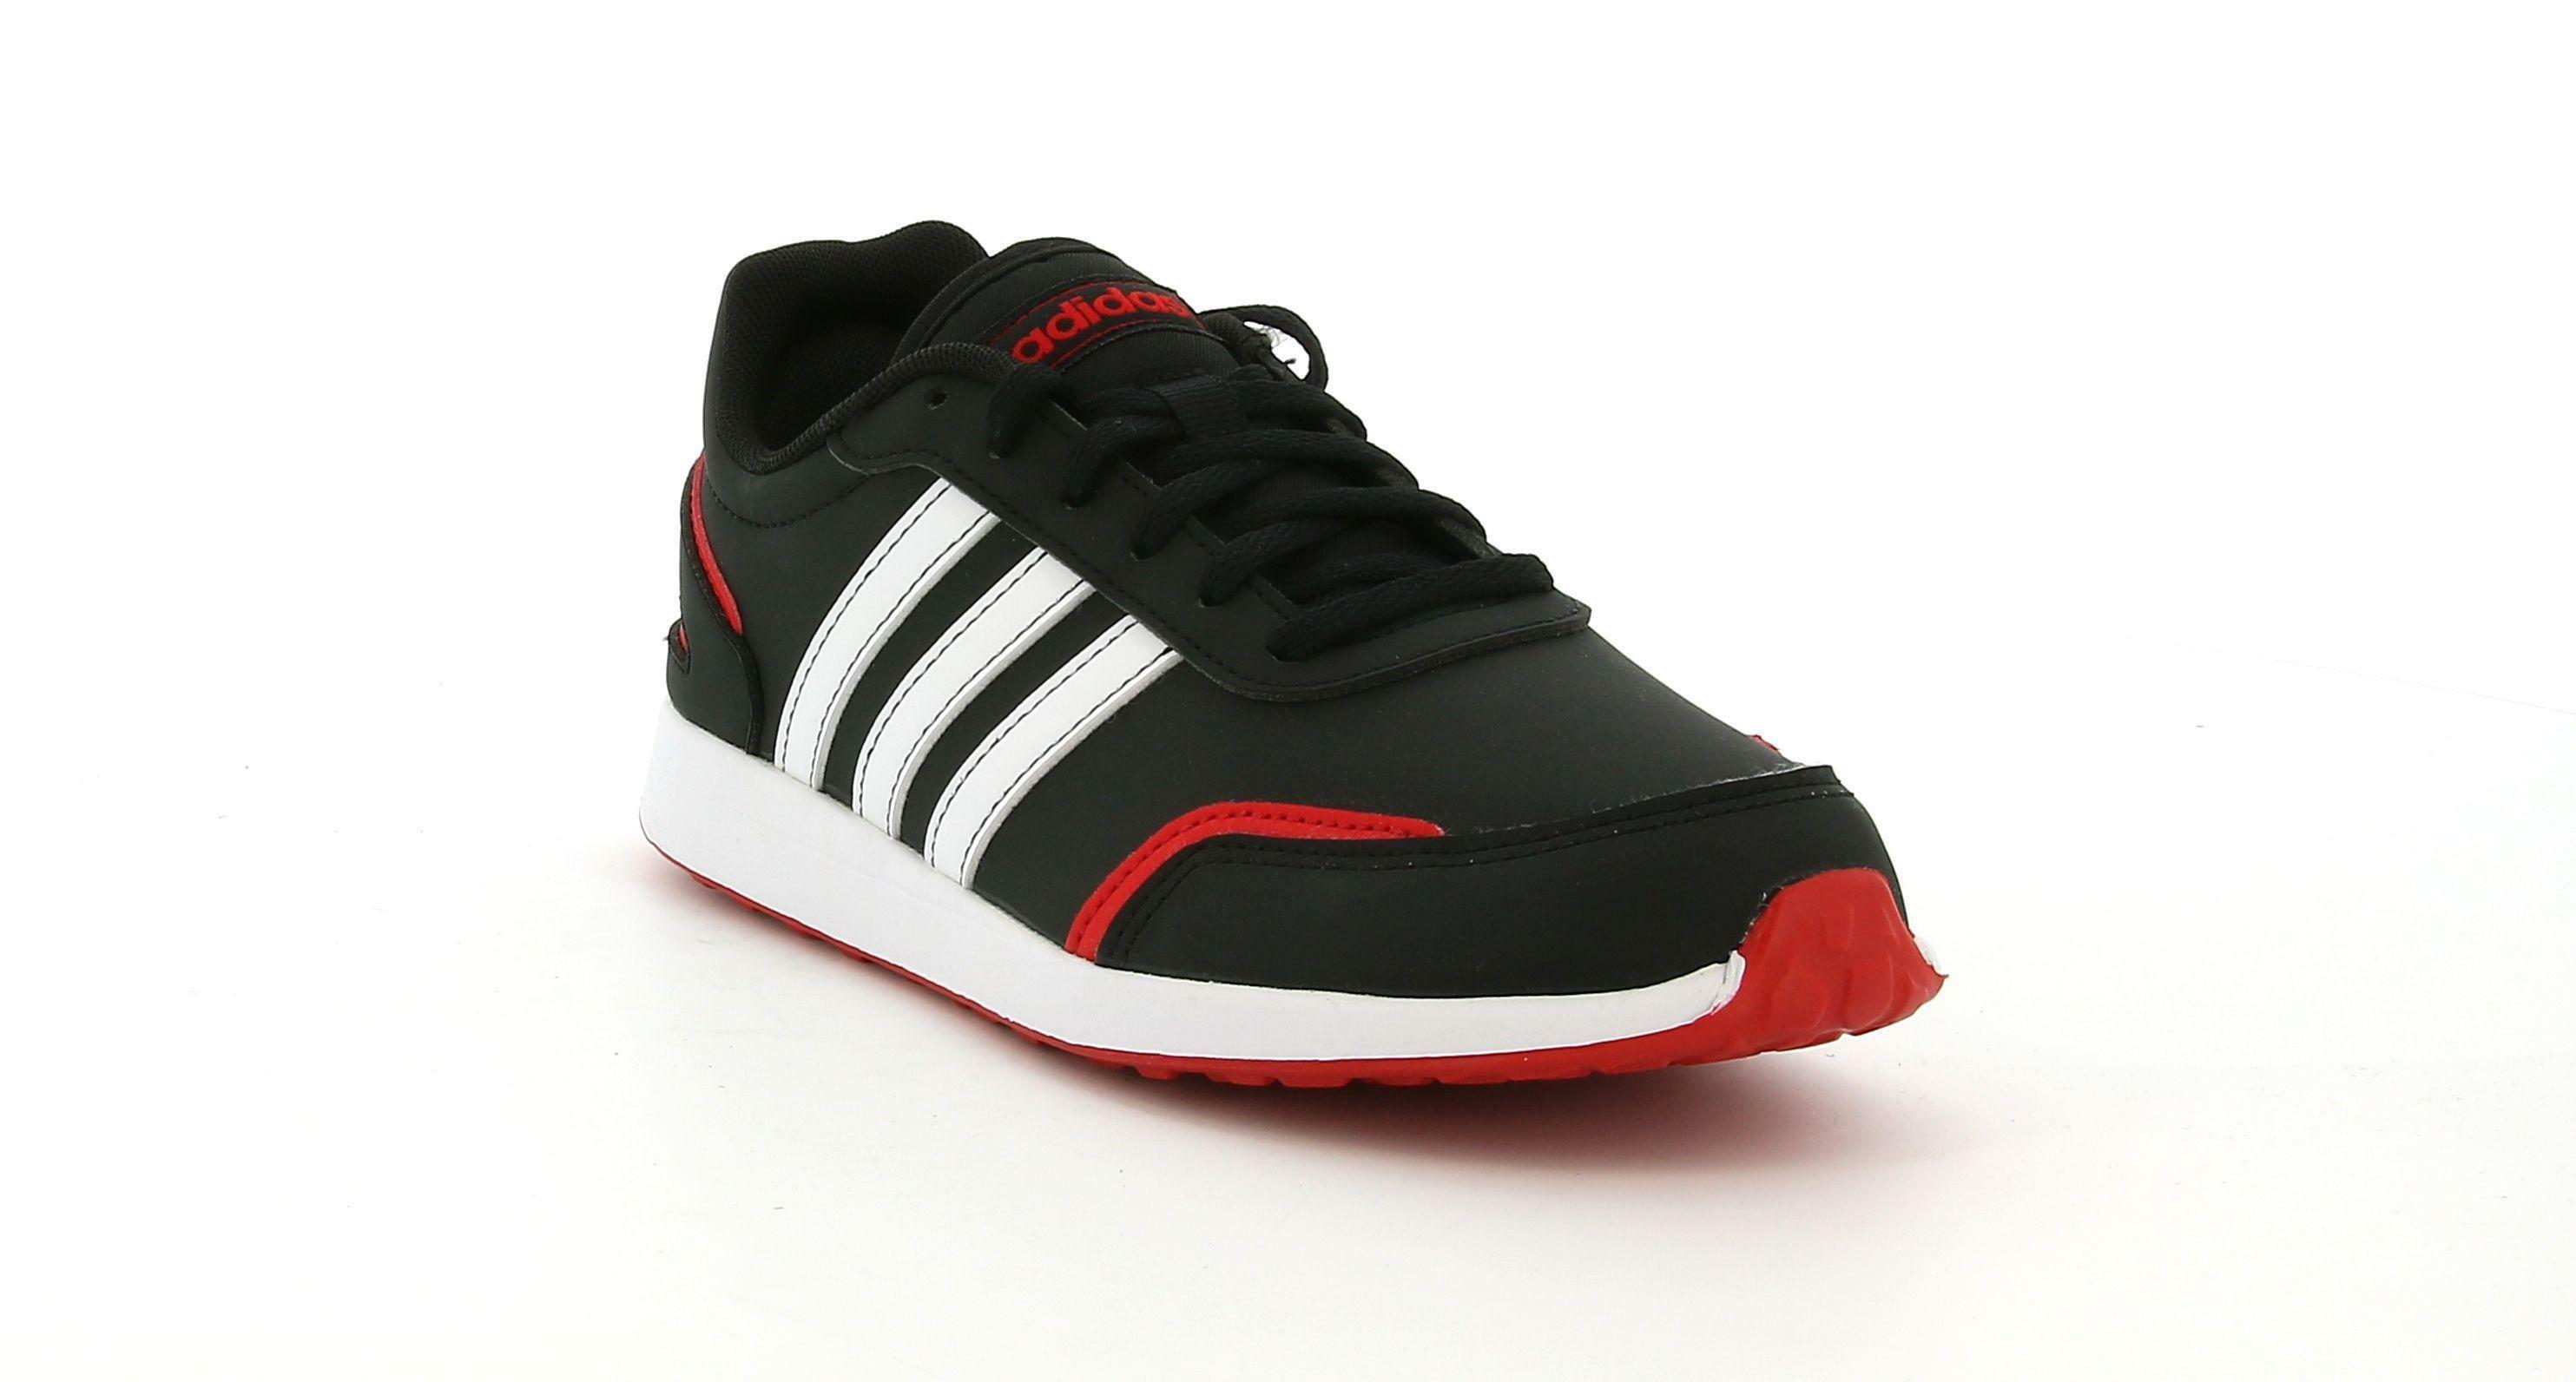 adidas adidas vs switch 3 k scarpe da ginnastica unisex bambini fw3962